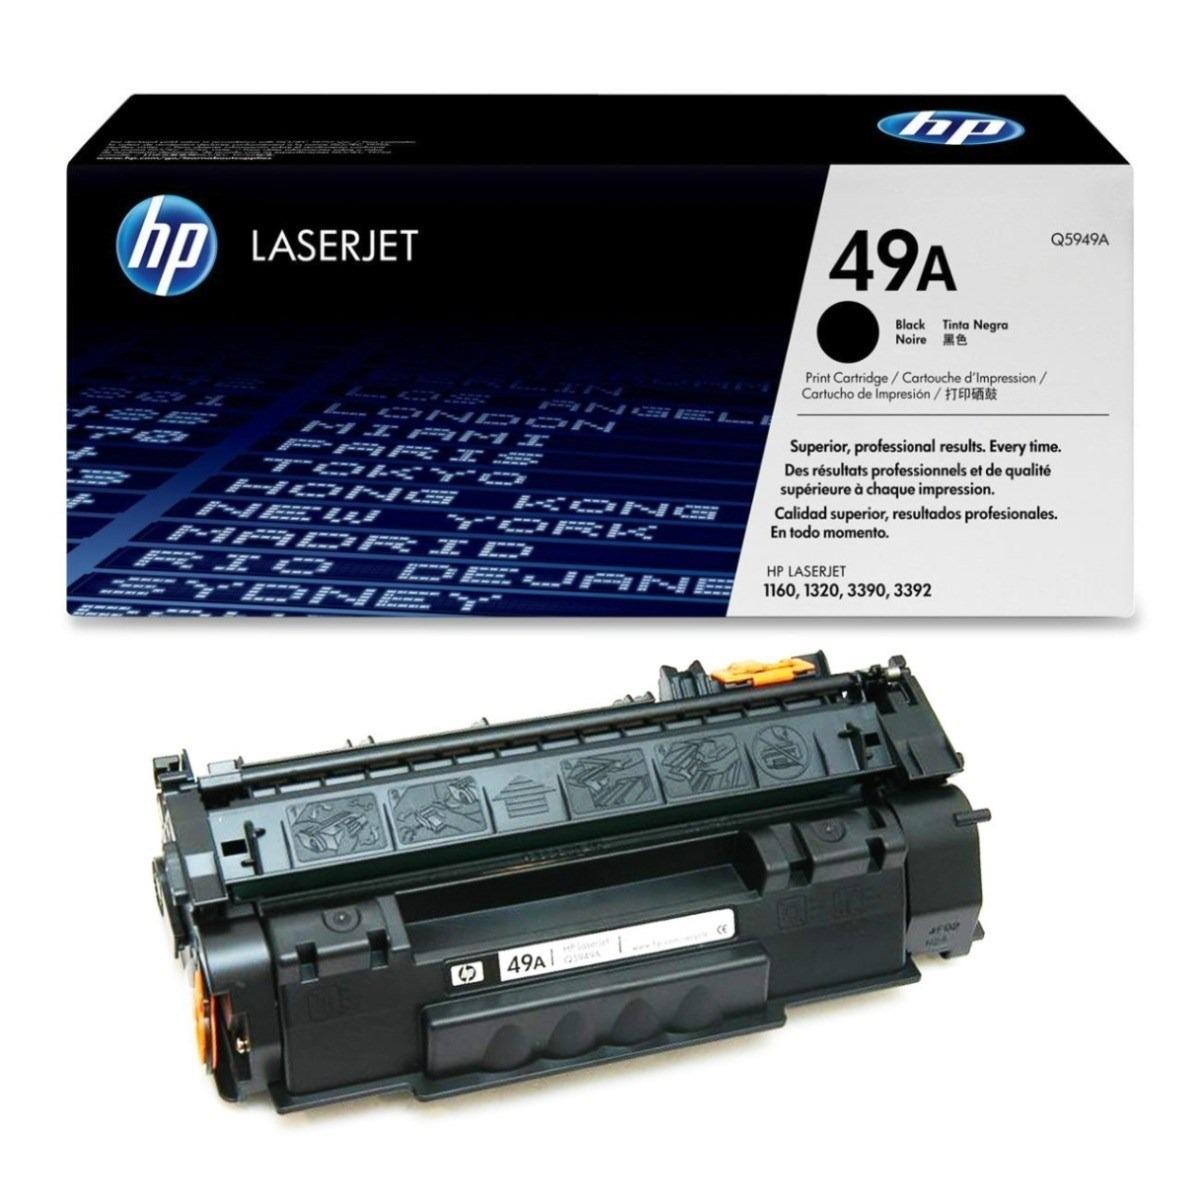 Восстановление картриджа Q5949A для HP LaserJet 1320